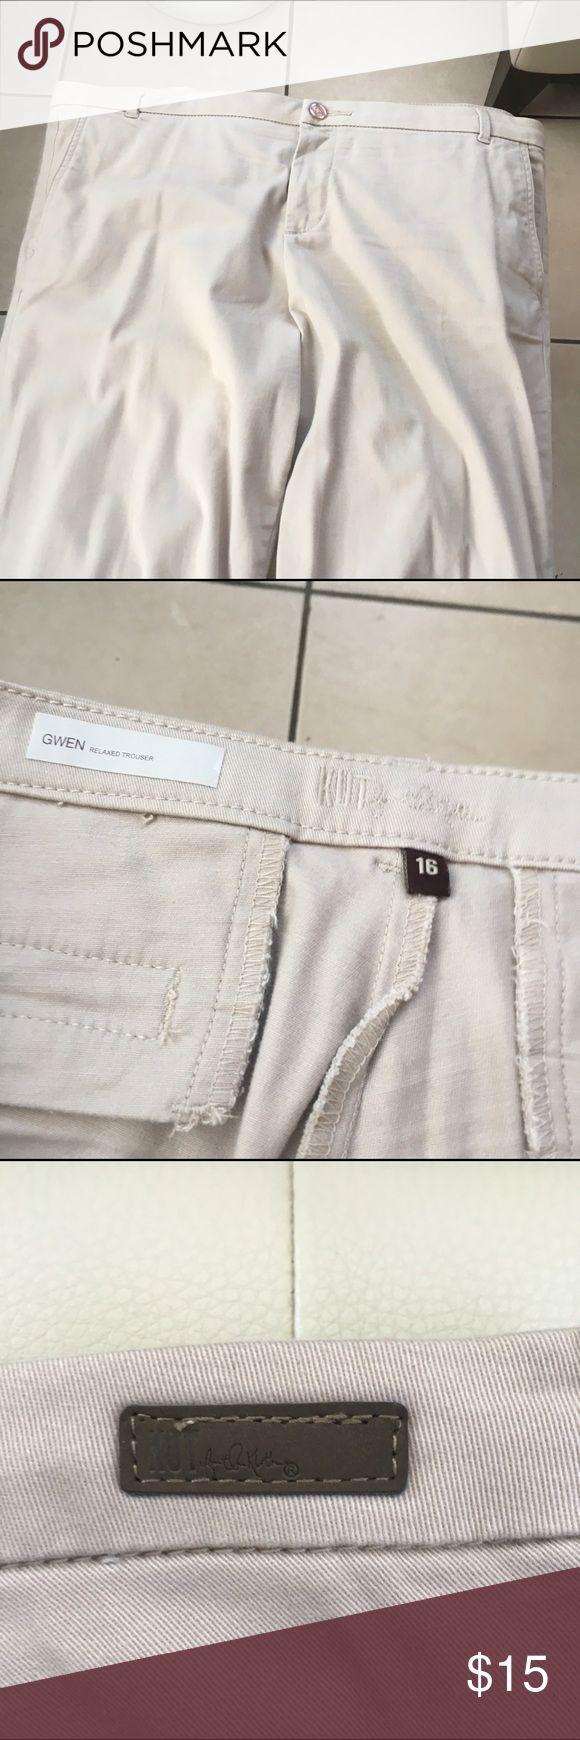 ( SOLD )Women khaki pant Women casual khaki pant, size 16 , like new, excellent condition Pants Boot Cut & Flare